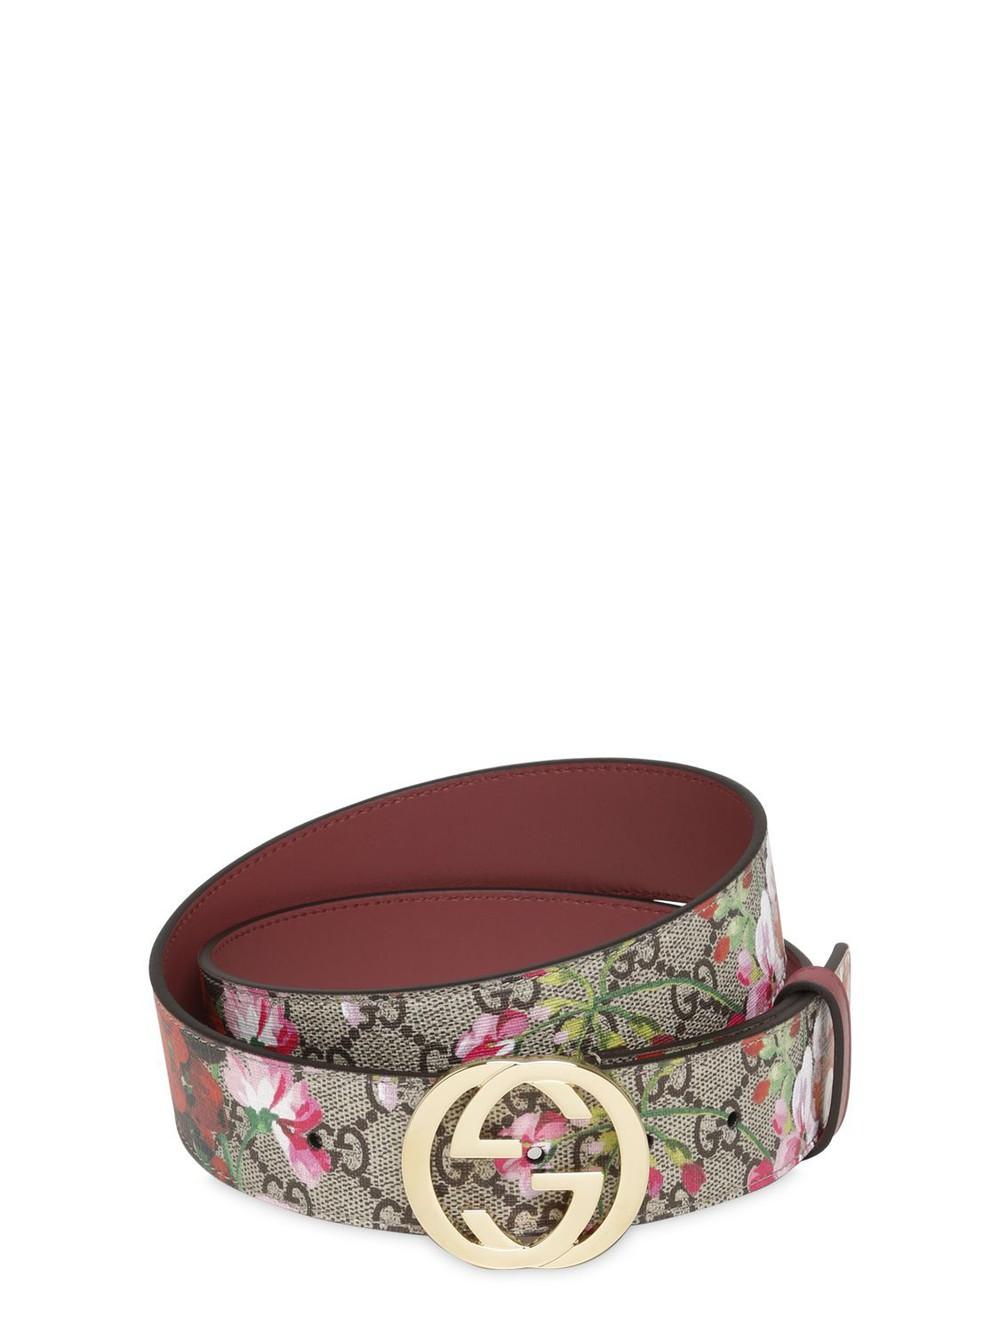 5edc2f51f9b GUCCI GG-logo 2cm leather belt in pink - Wheretoget